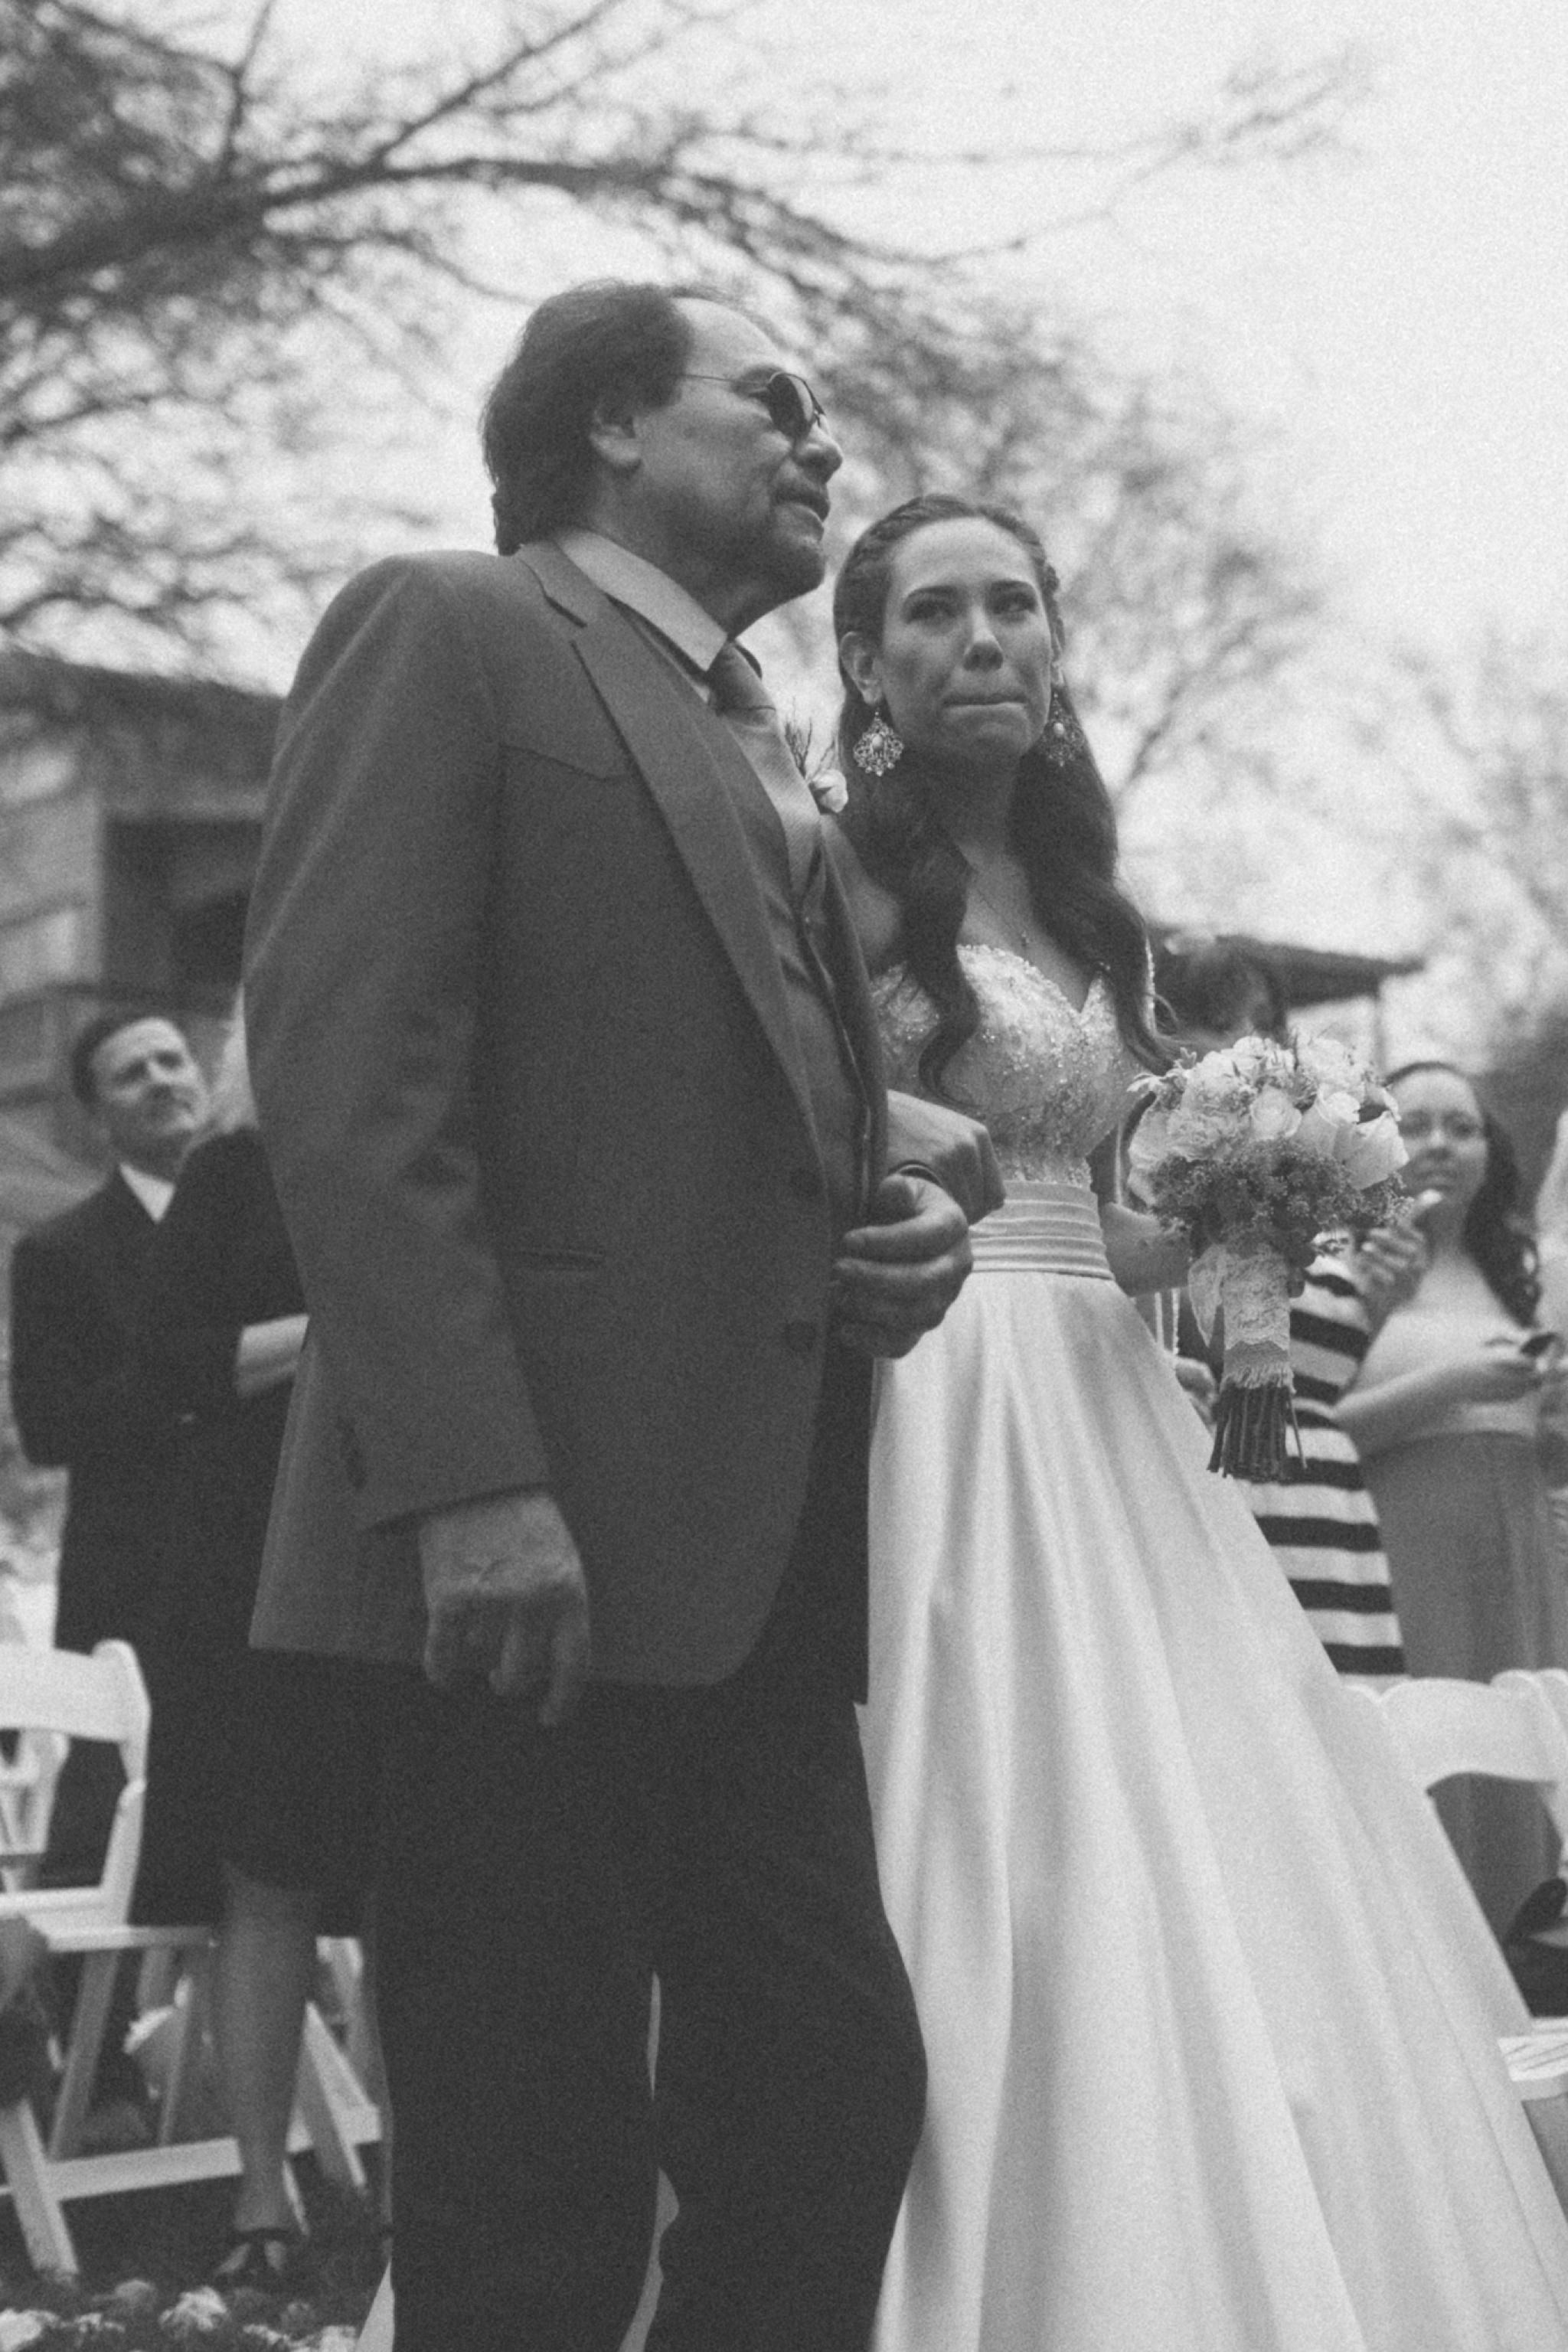 Milltown-Historic-Distric-Wedding-New-Braunfels-011.jpg